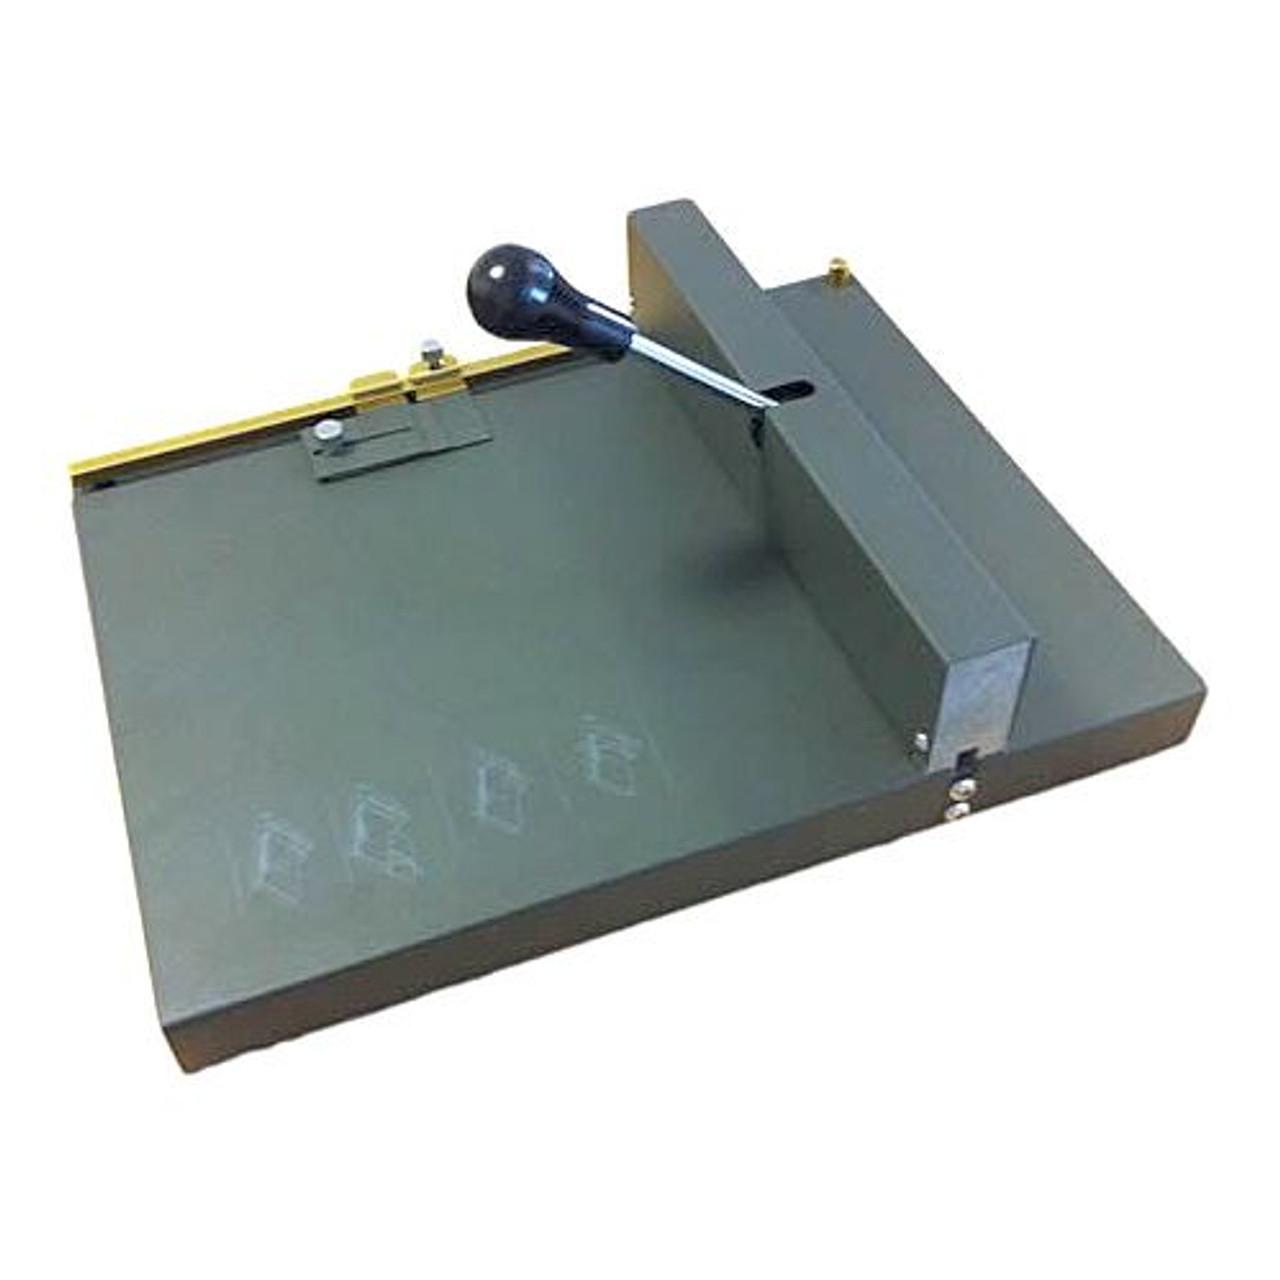 "Galaxy ""Crease & Go"" Hand Operated Paper & Card Creasing Machine"